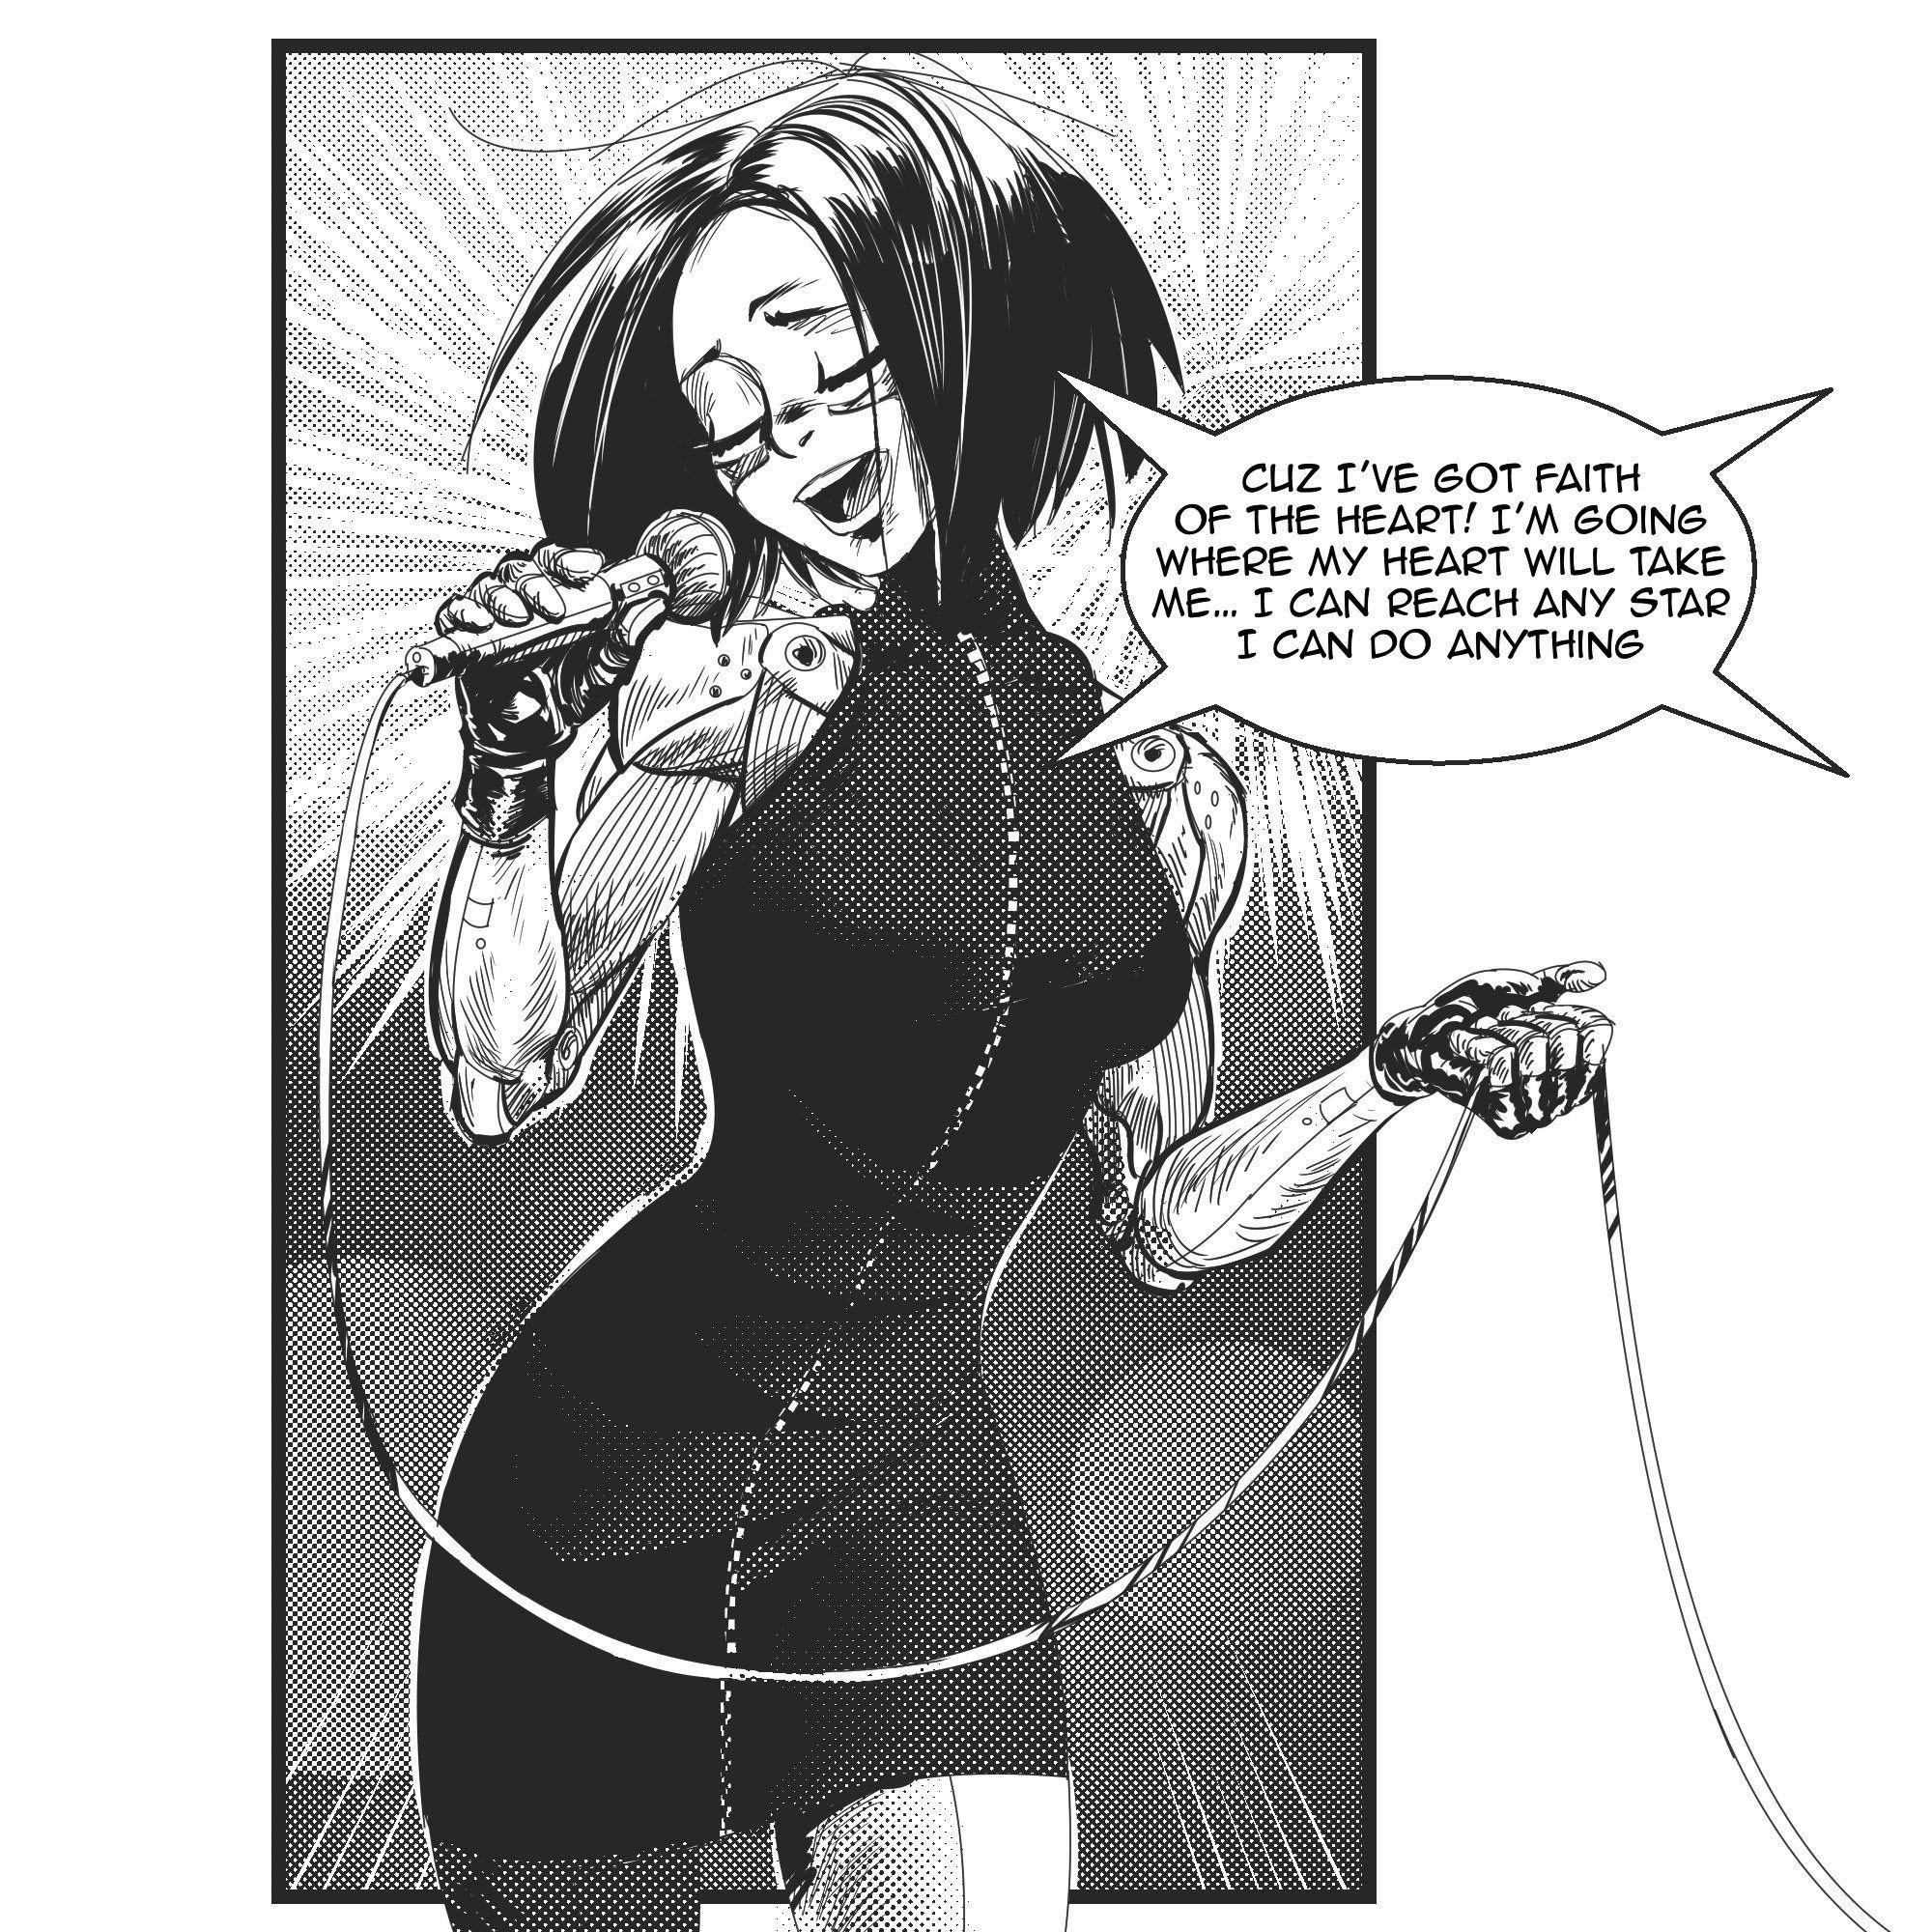 Pin by 𝓜𝓪𝓼𝓴𝓮𝓭 𝓜𝓪𝓲𝓭𝓮𝓷(ギネ) on Alita battle angel manga